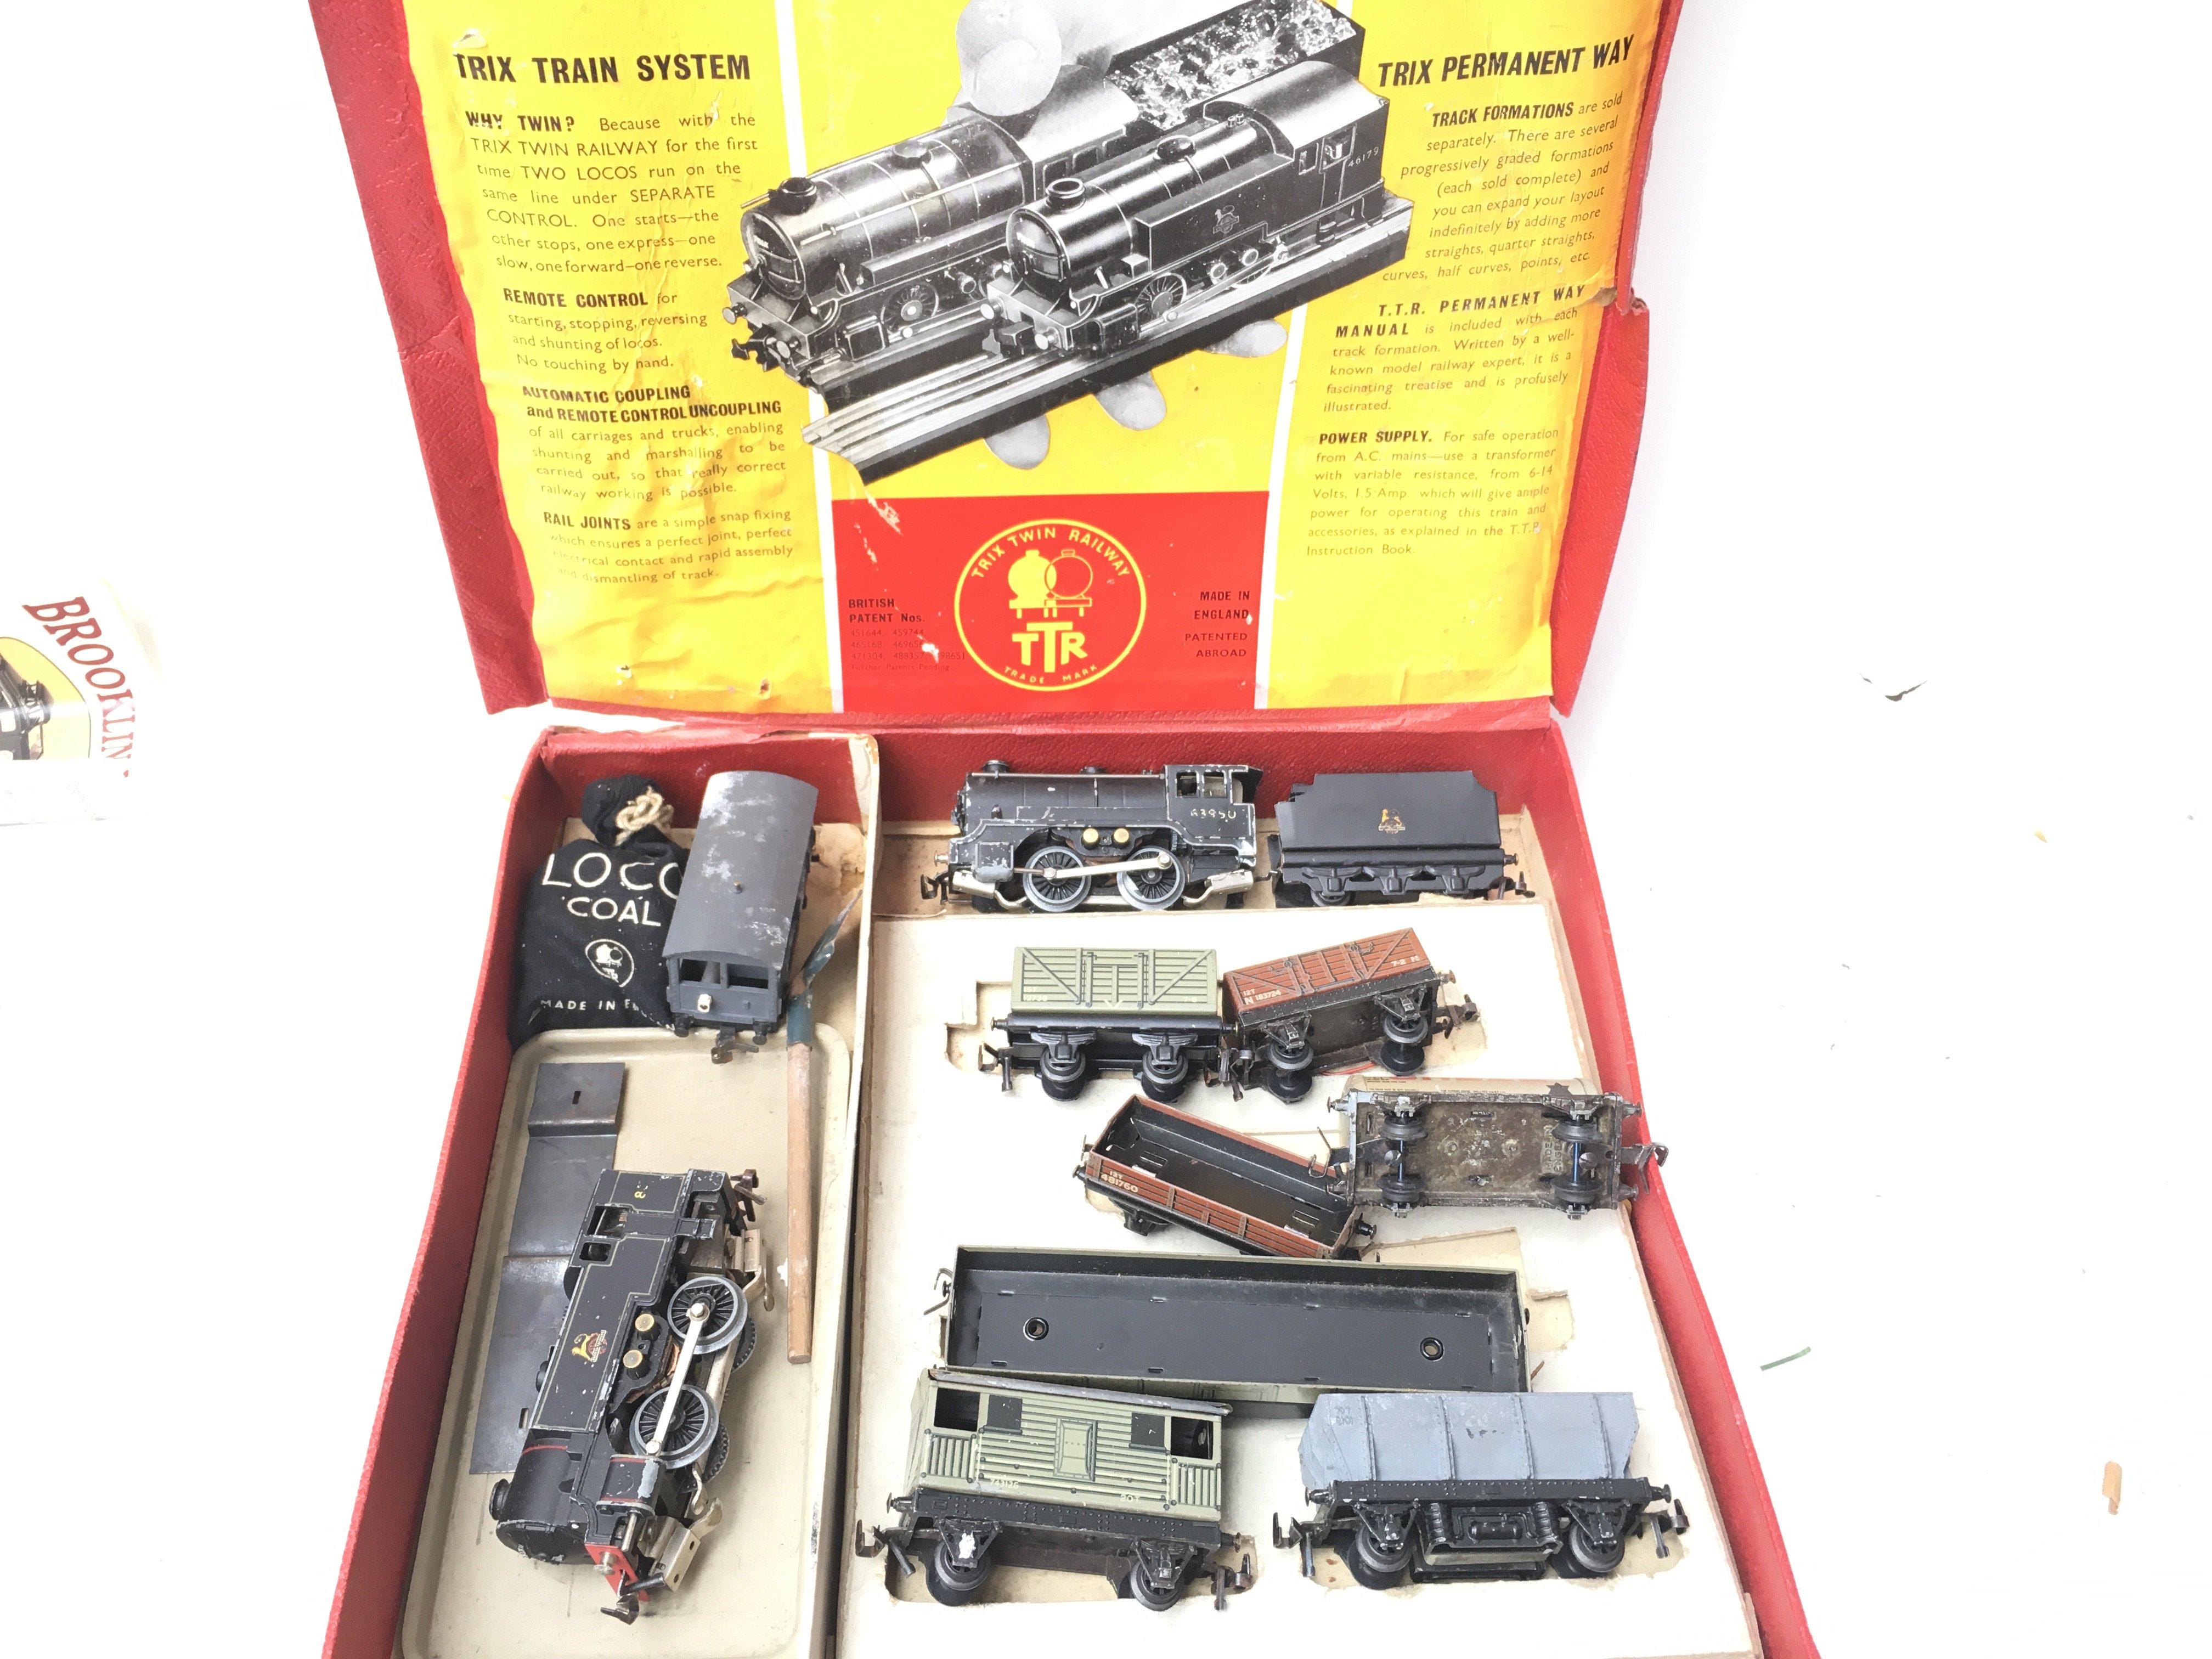 A Box Containing Trix Twin Railway.